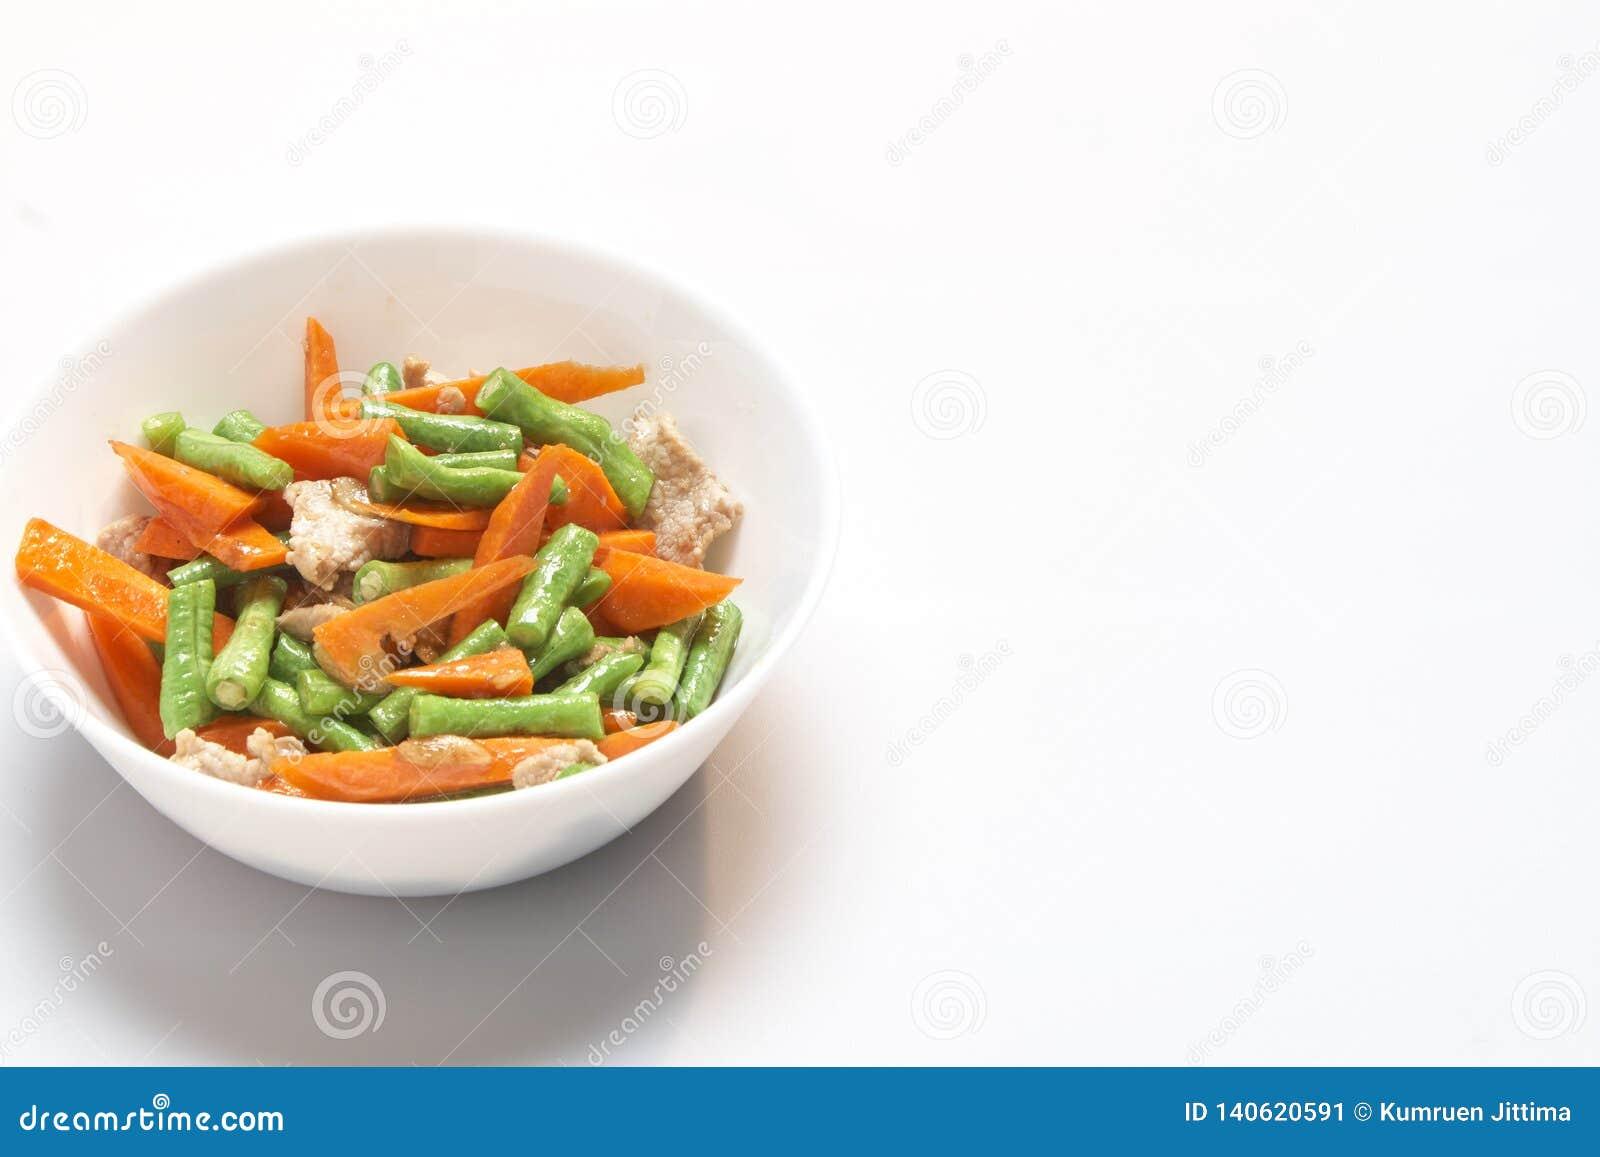 Fried Porki Long bean with carrot